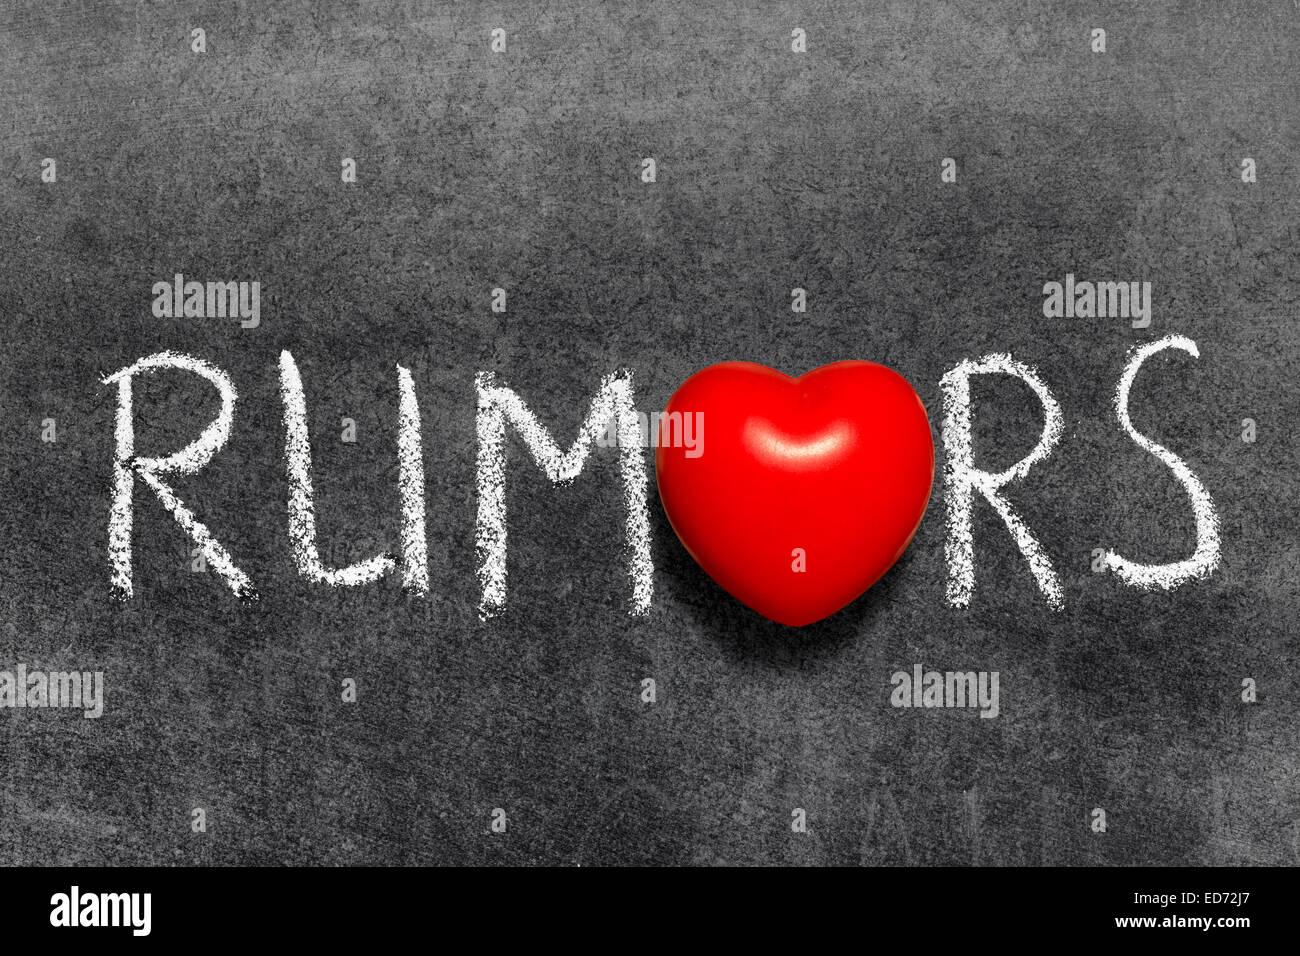 Rumors word handwritten blackboard with heart symbol instead of o rumors word handwritten blackboard with heart symbol instead of o biocorpaavc